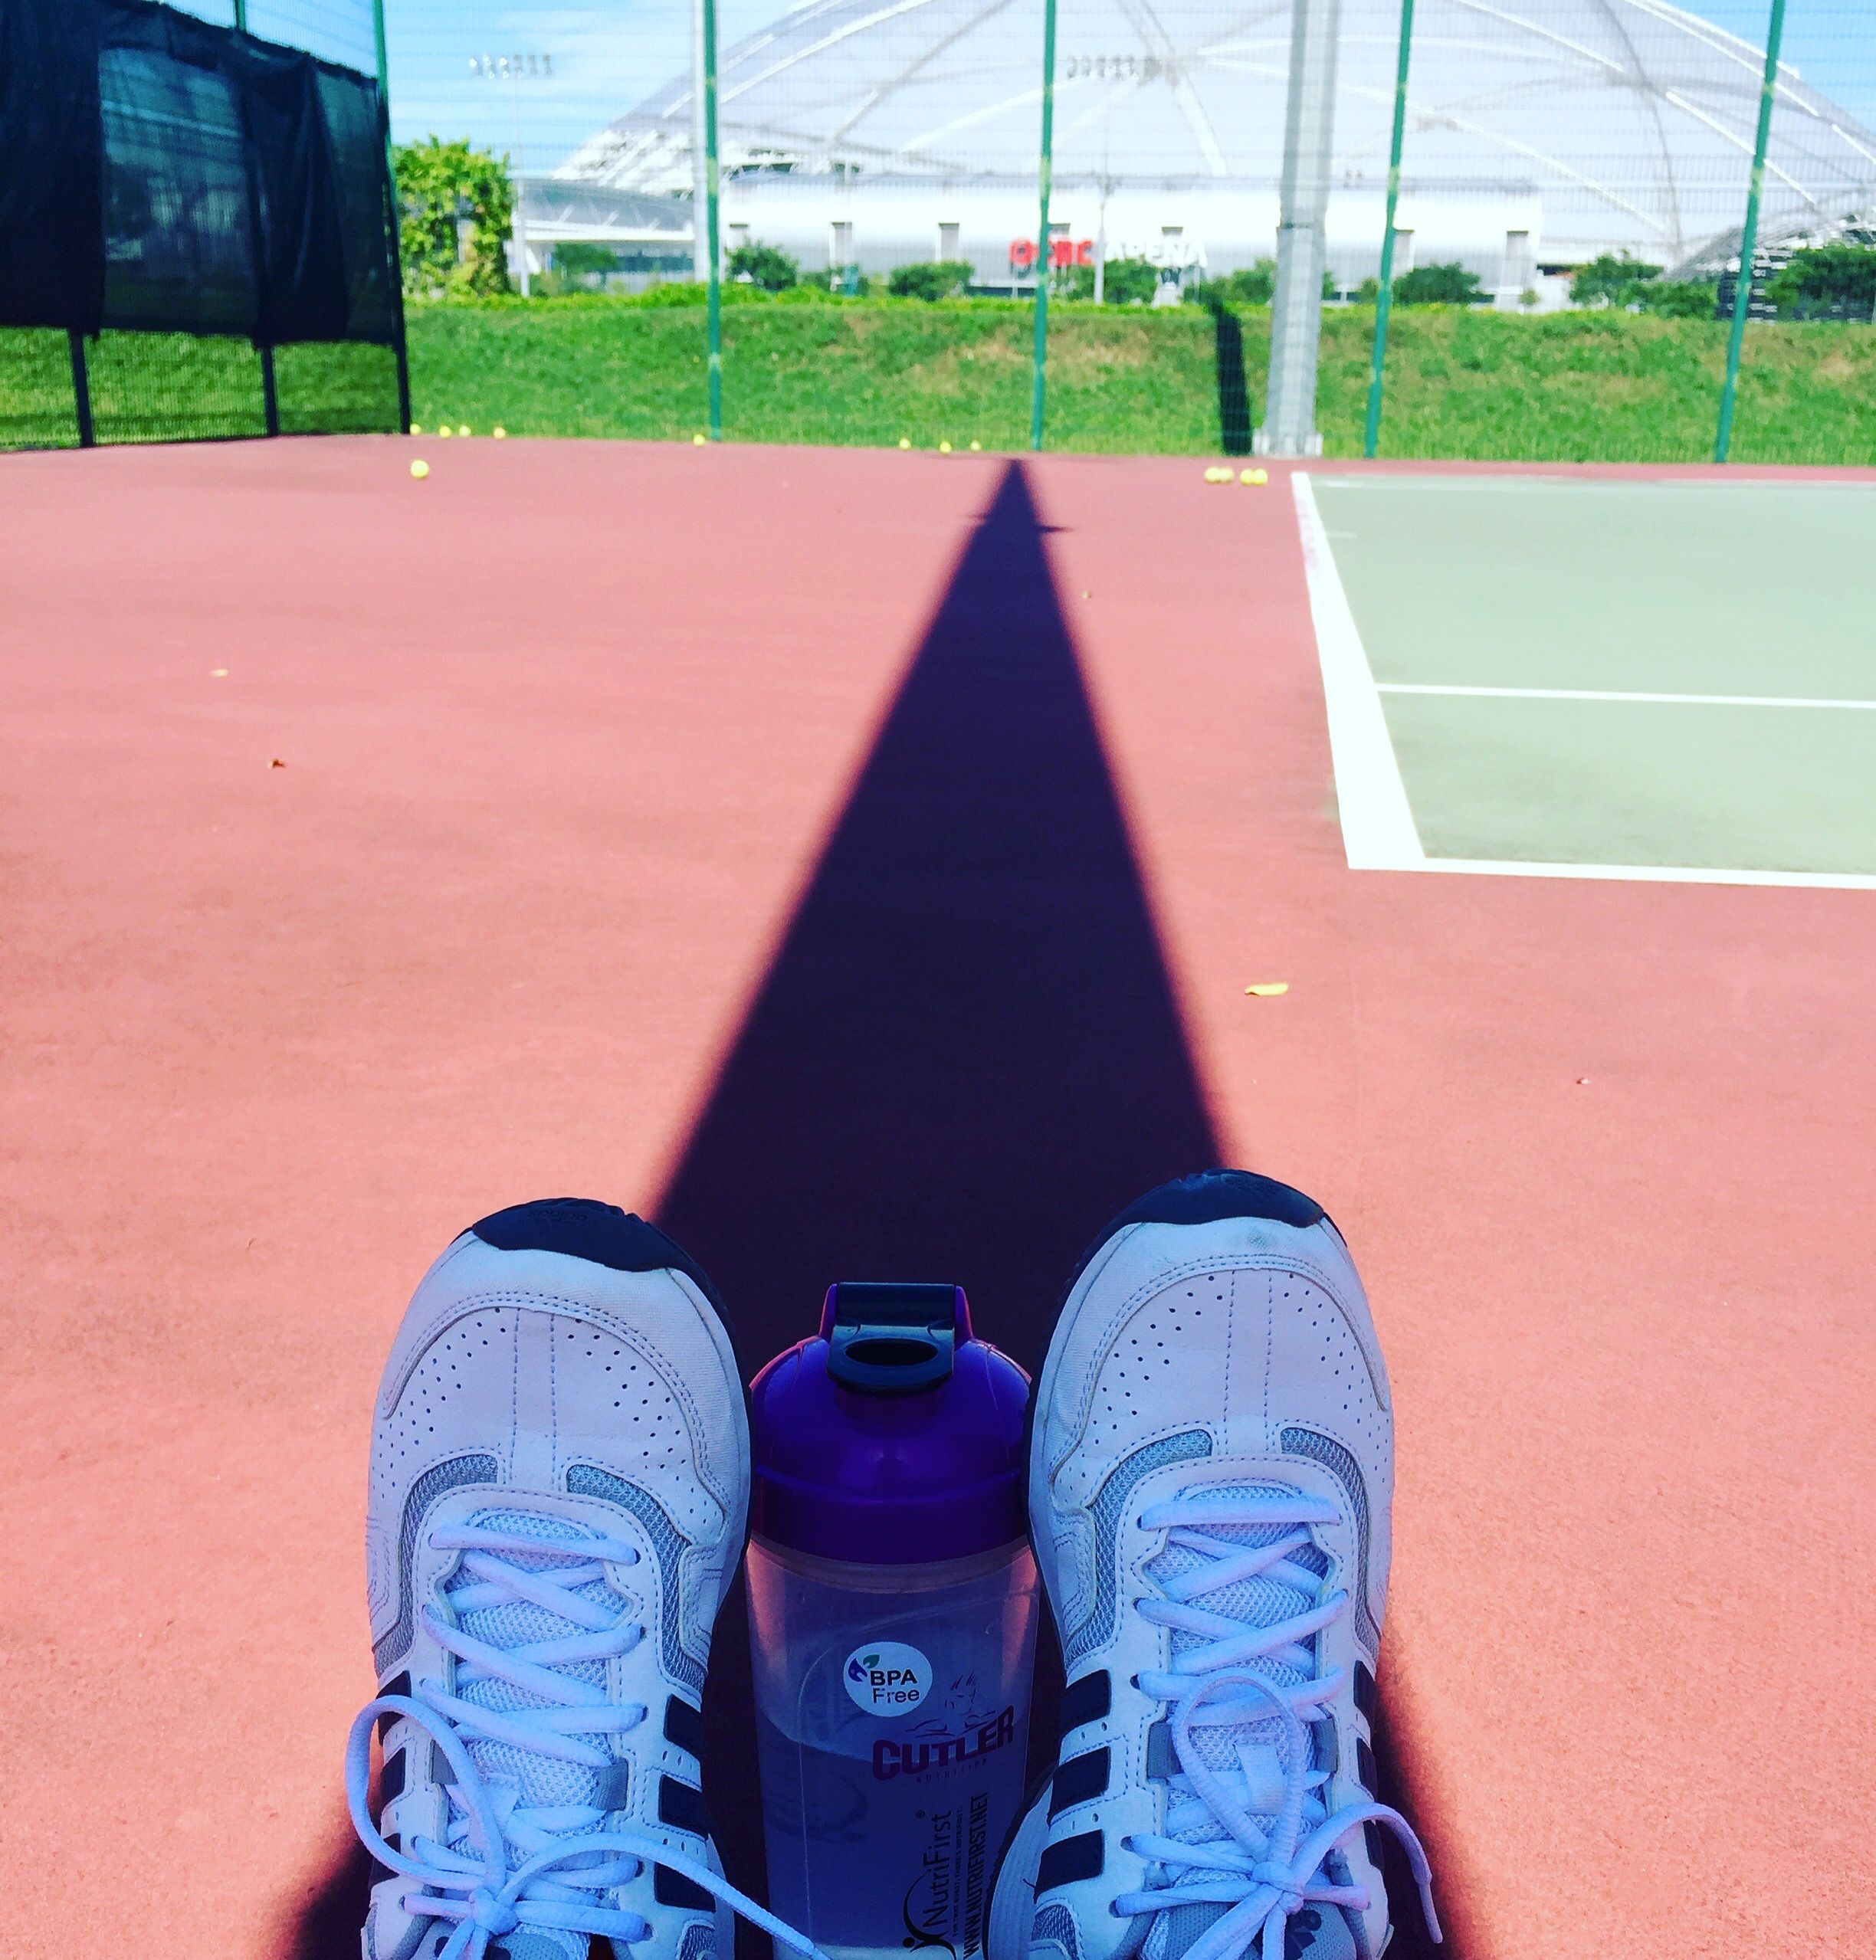 Seeking refuge anywhere where there is shade @ Kallang Tennis Ctr - Singapore